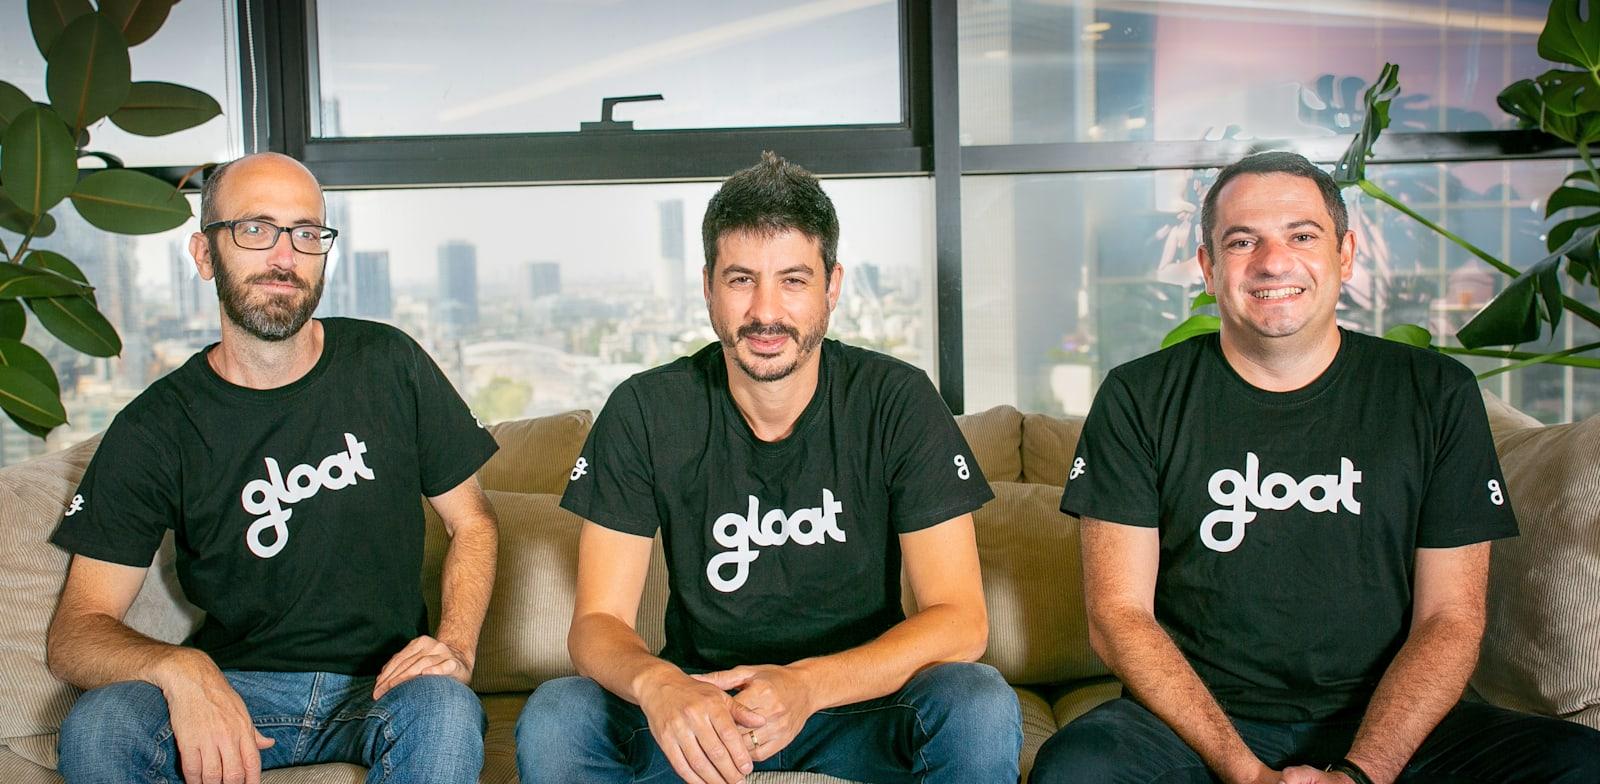 Gloat founders Photo: Ma'ayan Schwartz